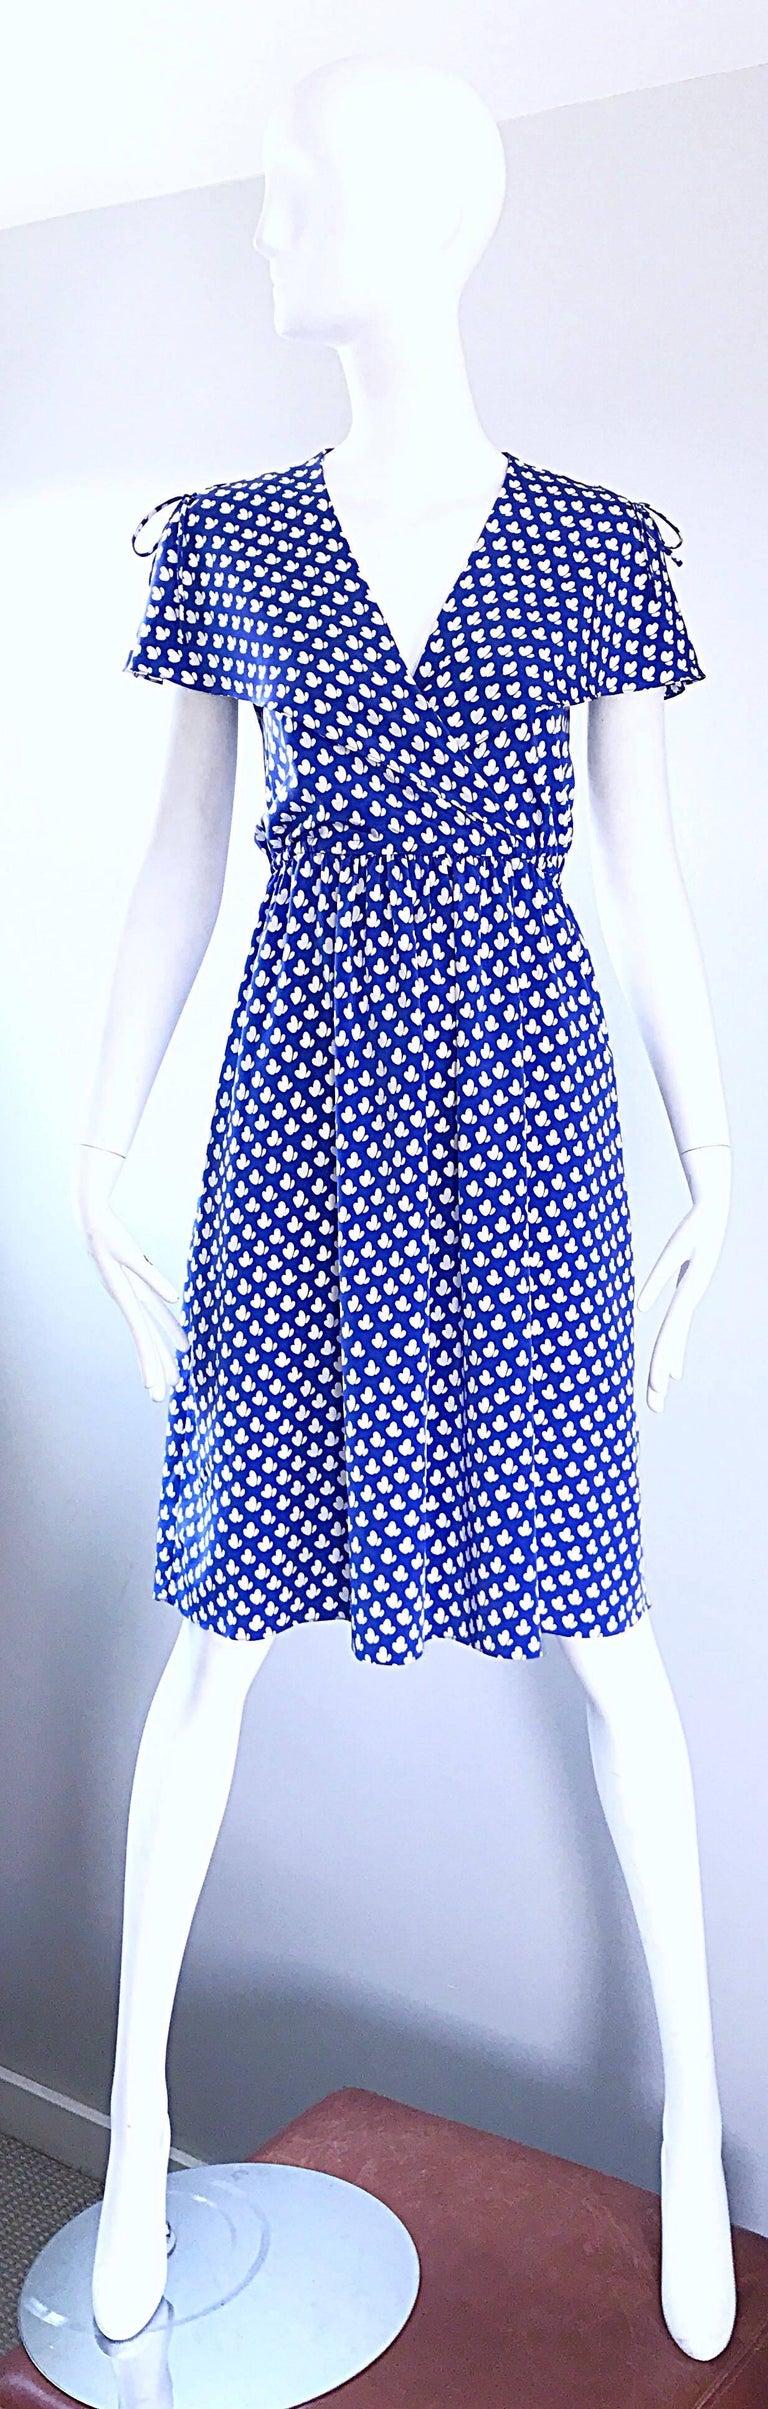 Vintage Pierre Cardin 1970s Blue + White Heart Print Flutter Sleeve 70s Dress For Sale 4